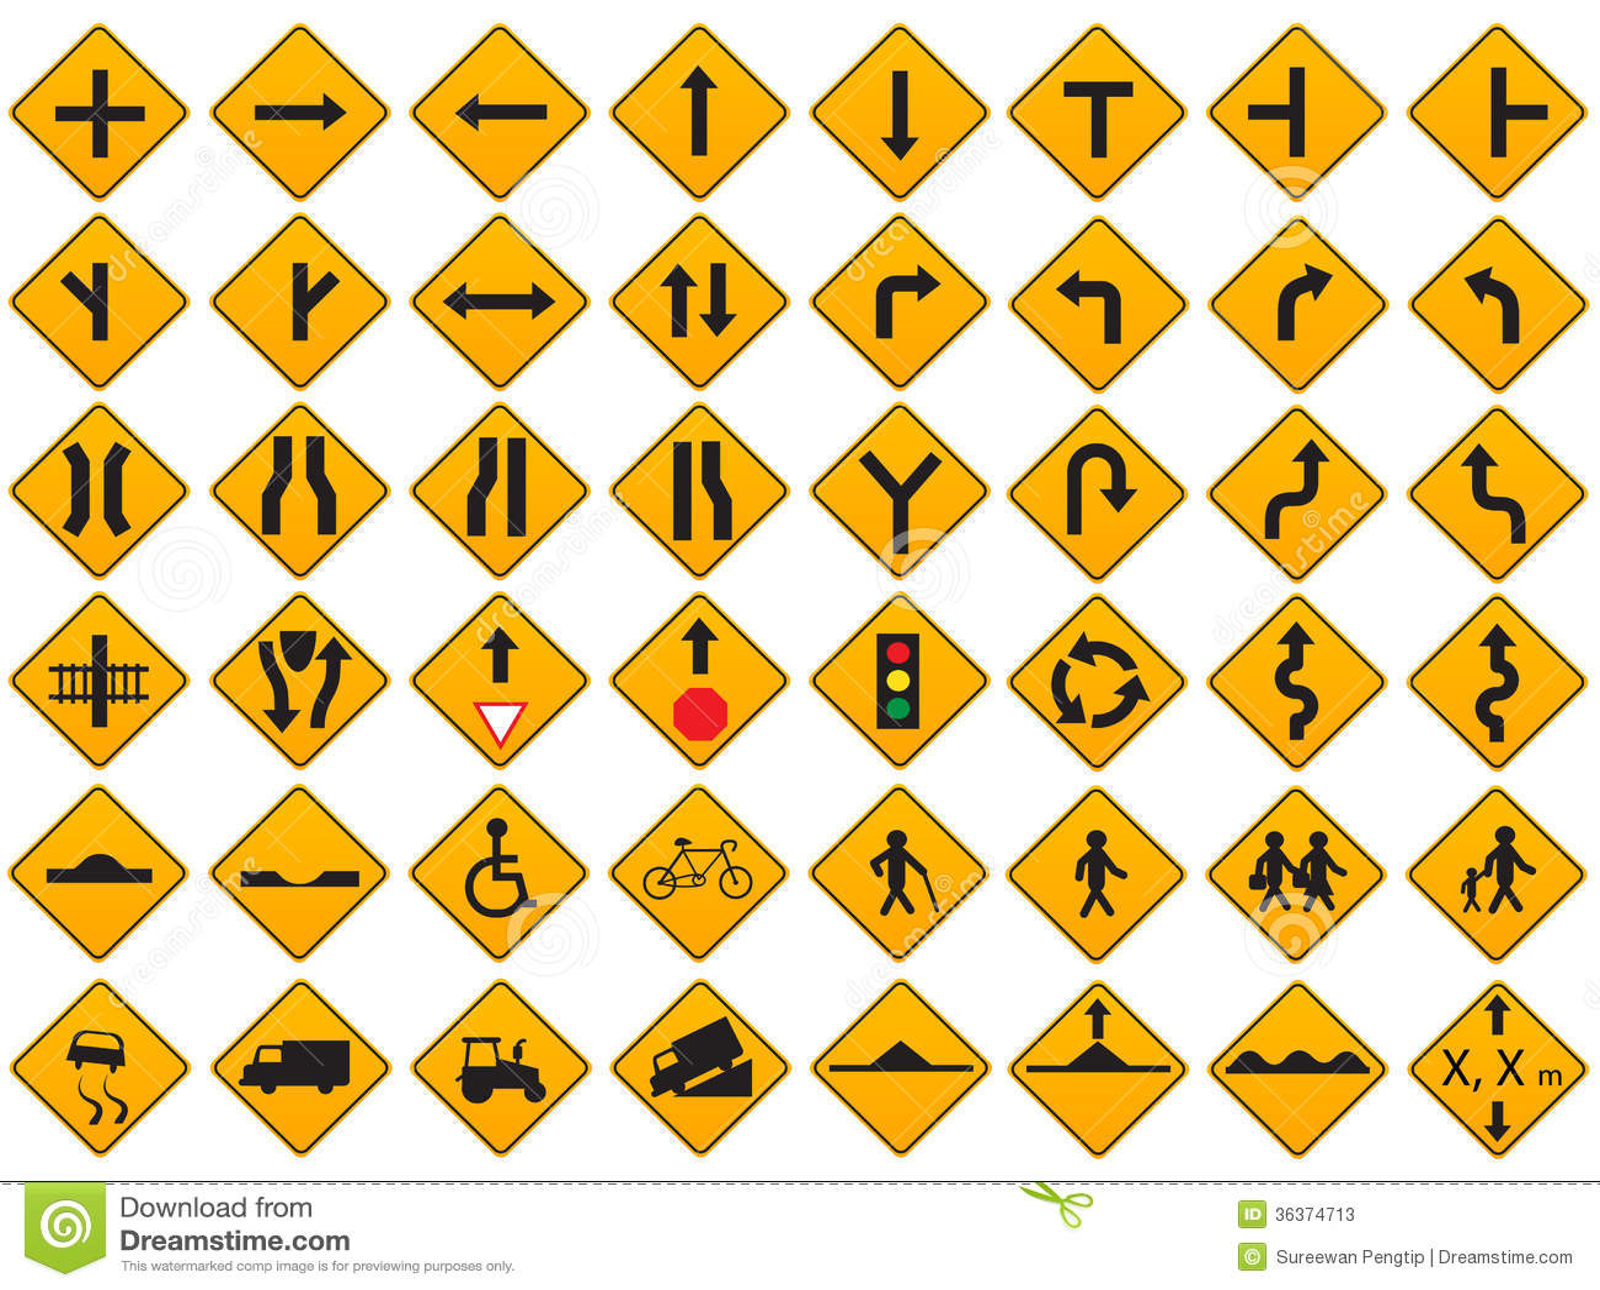 Driver License Renewal Road Signs